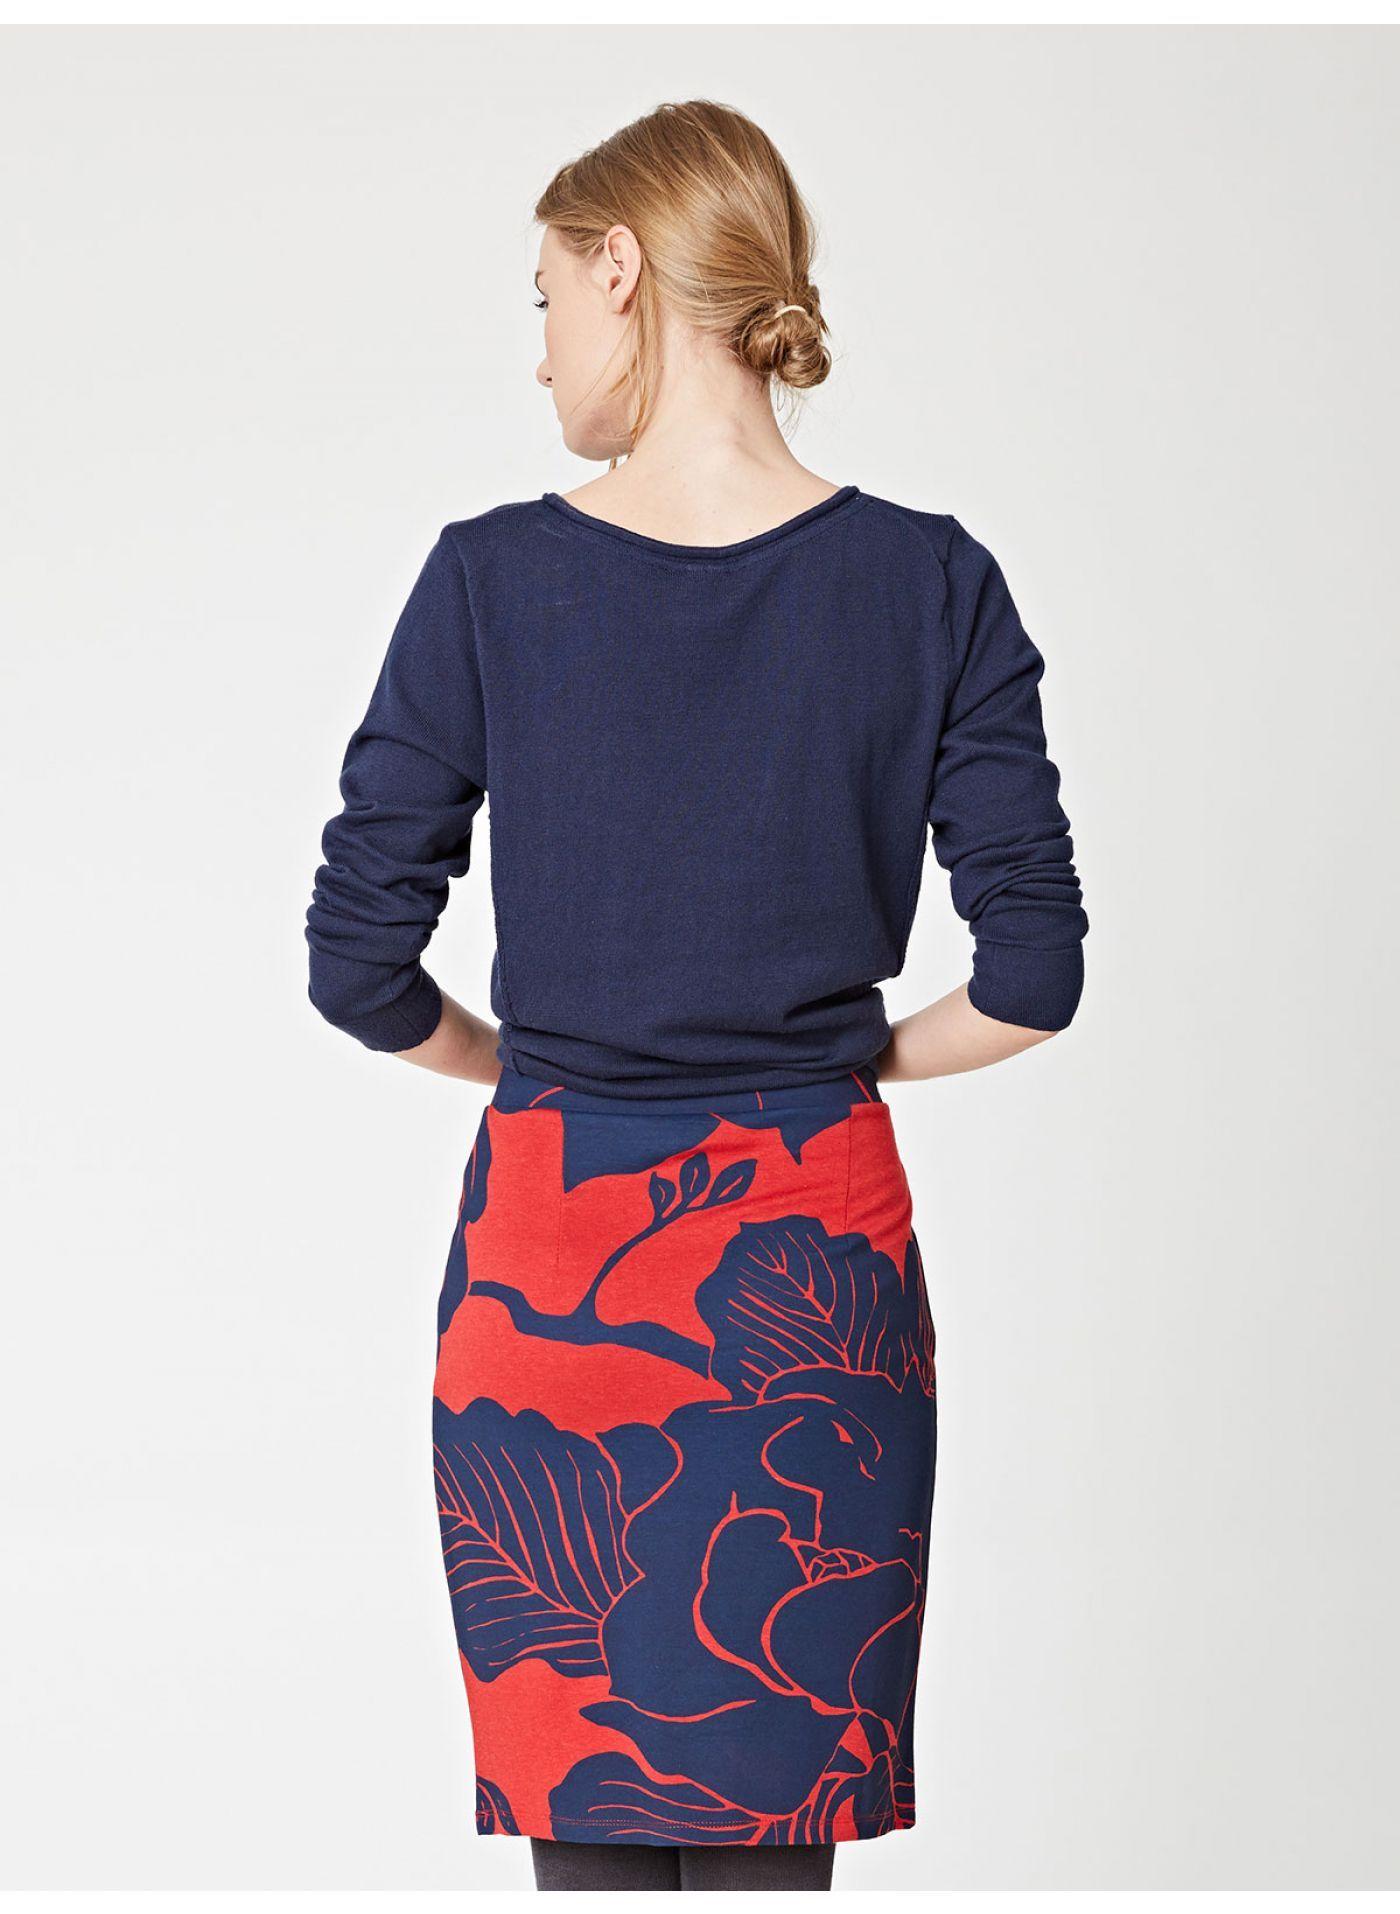 e6bfacb744 Hana Floral Organic Cotton Jersey Tube Skirt | I want to wear | Tube ...